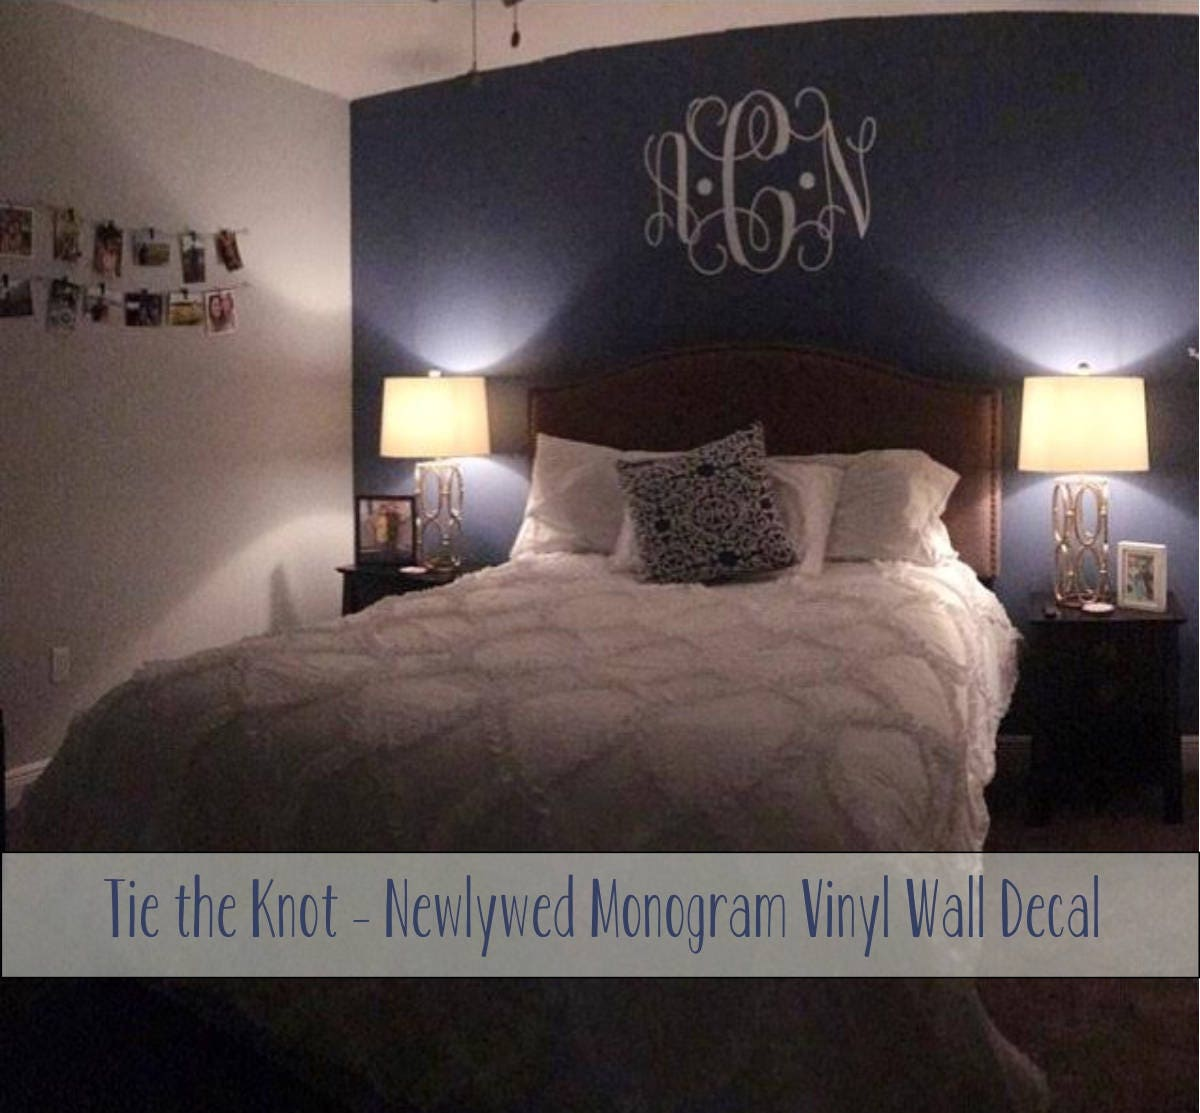 Vine Monogram Decal | Large Monogram Wall Decal | Master Bedroom Wall Decal | Wedding Monogram | Newlywed Monogram Wall Decal & Vine Monogram Decal | Large Monogram Wall Decal | Master Bedroom ...